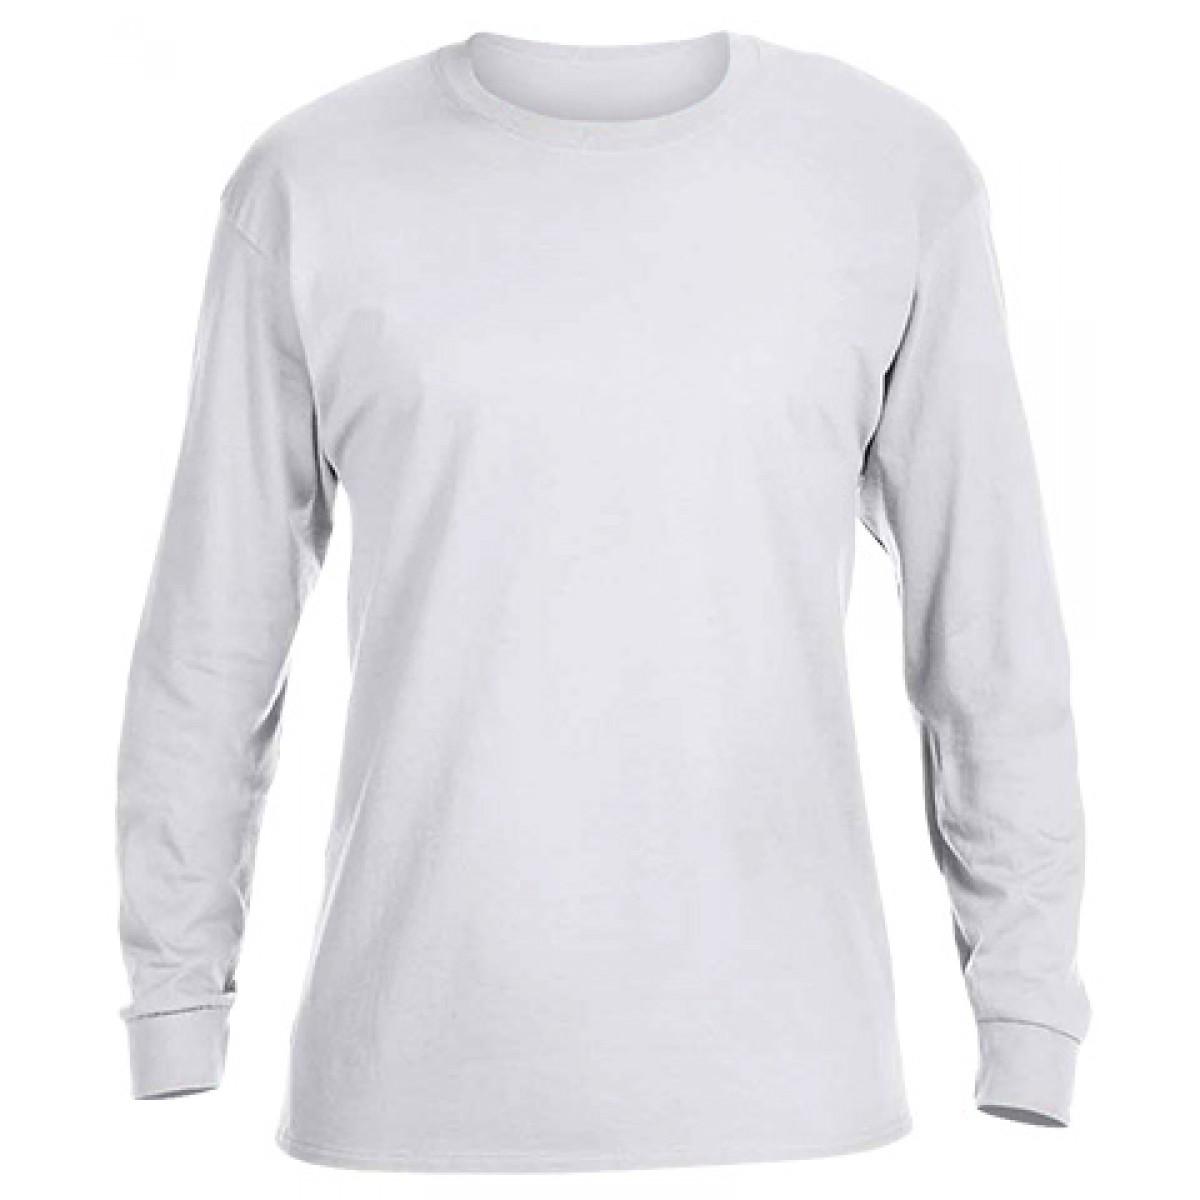 Ultra Cotton Long-Sleeve T-Shirts